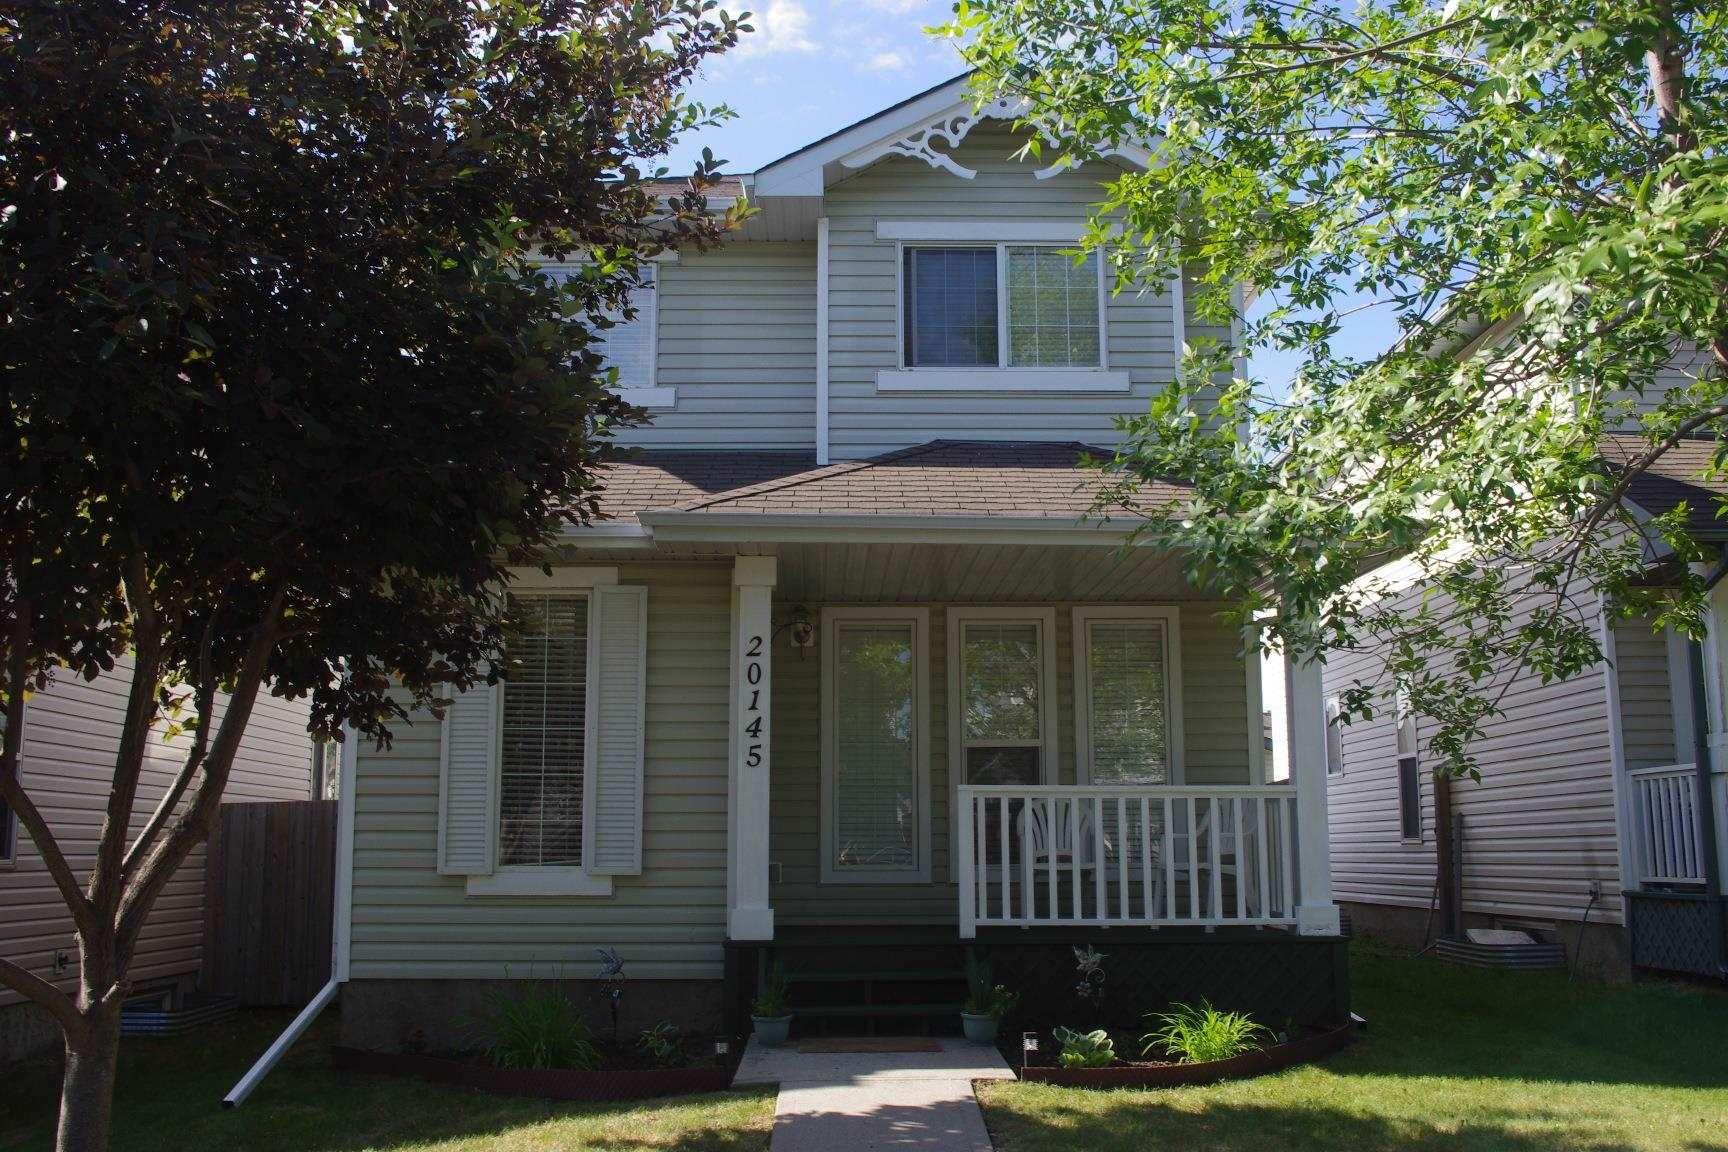 Main Photo: 20145 53 Avenue in Edmonton: Zone 58 House for sale : MLS®# E4252938